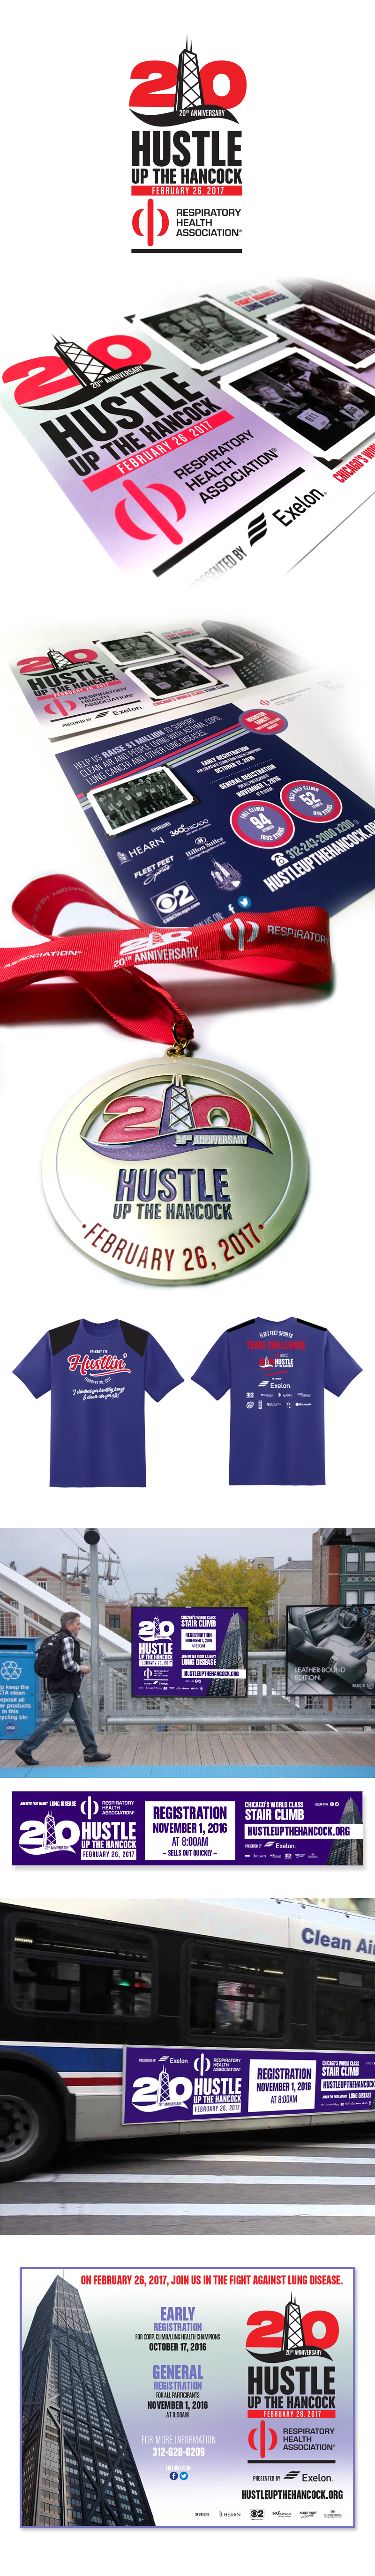 - RHA Hustle Up the Hancock 2017 Campaign.